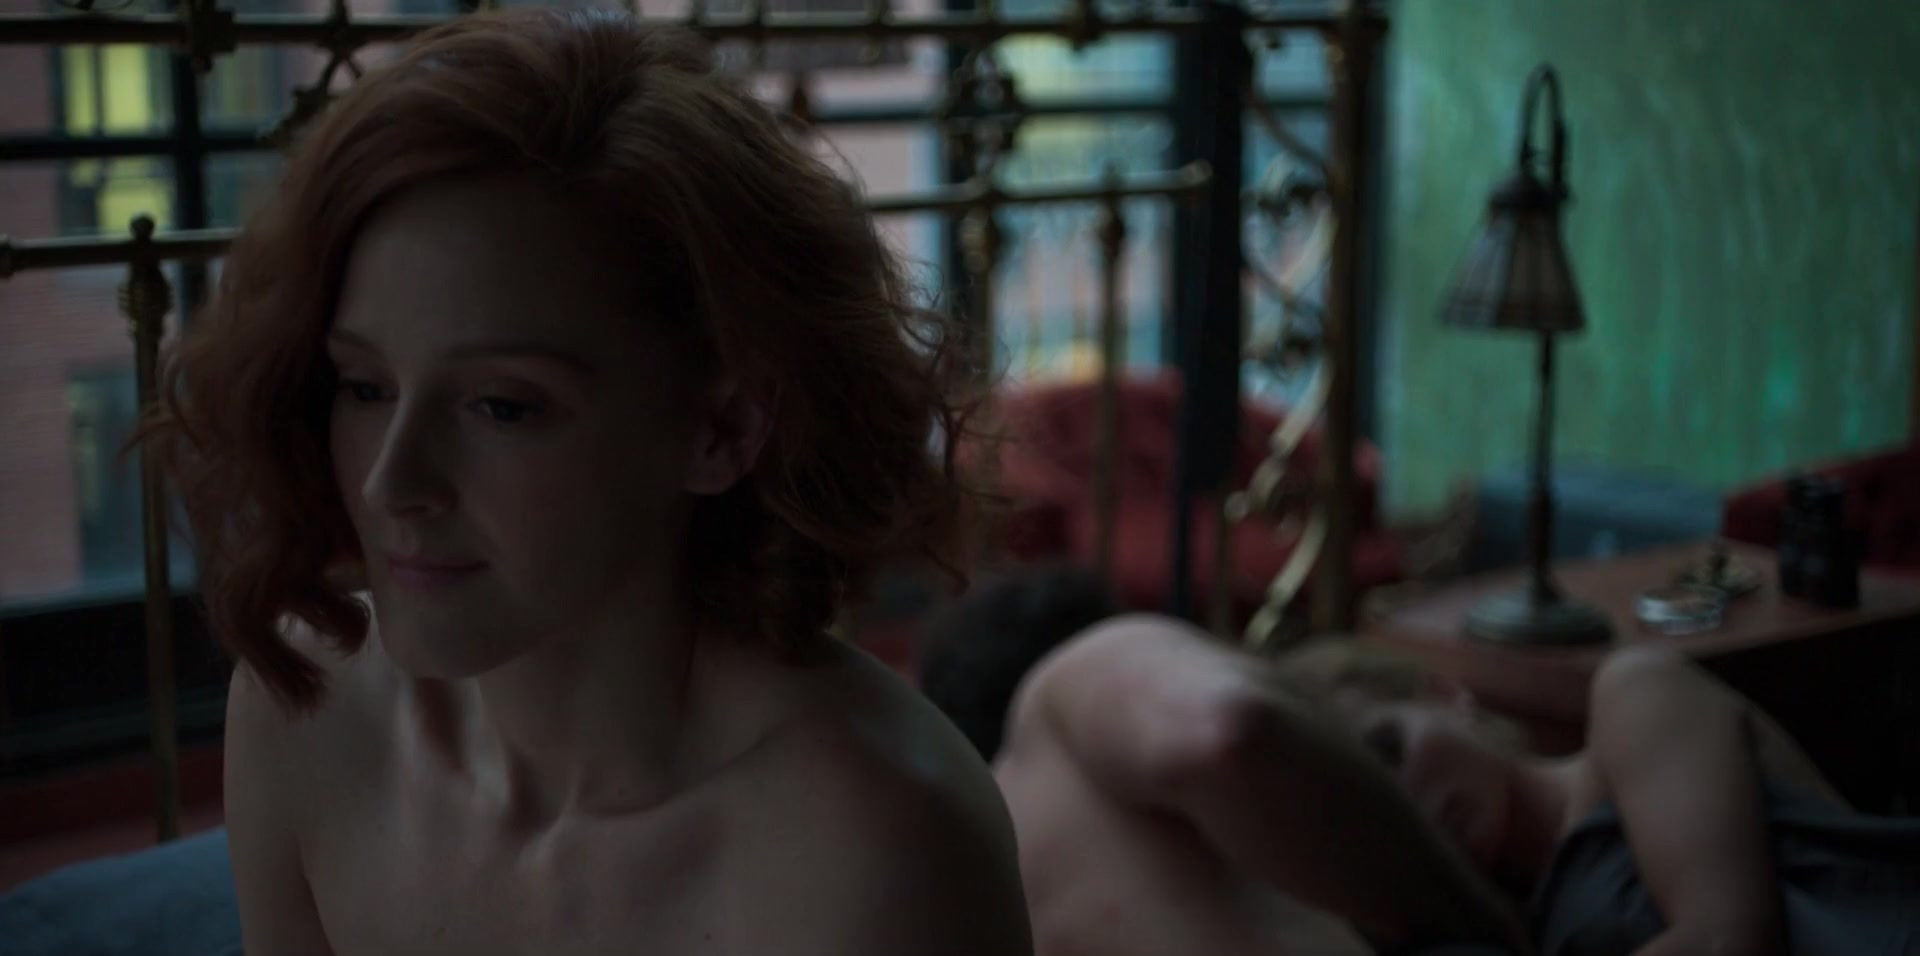 Ana Polvorosa Nude ana maria polvorosa, ana fernandez nude - cable girls s01e08